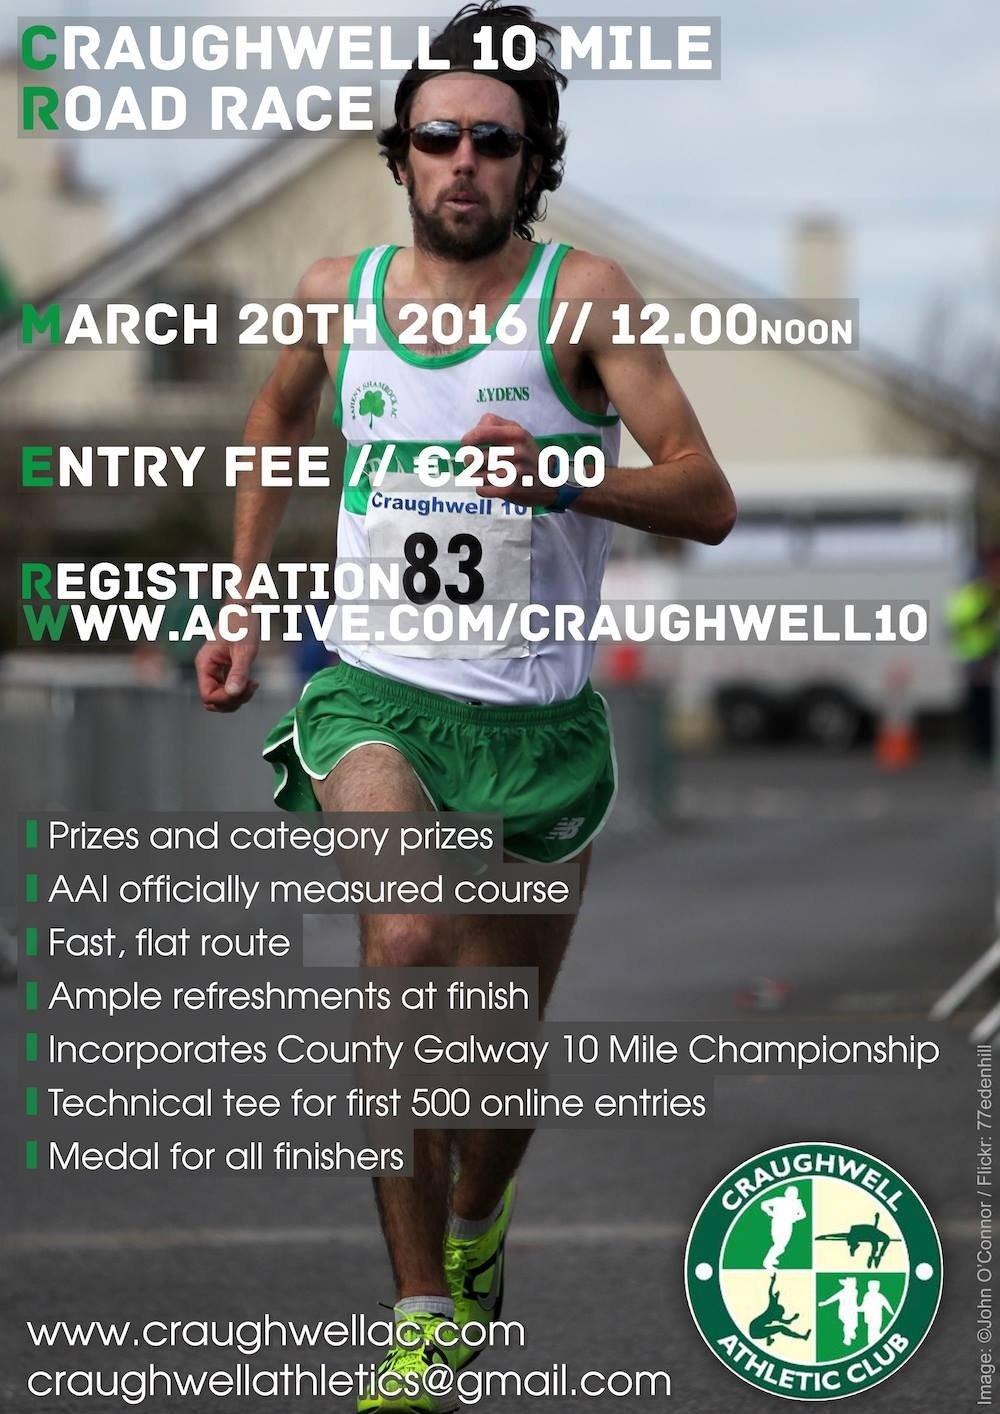 Craughwell 10 Flyer 2016